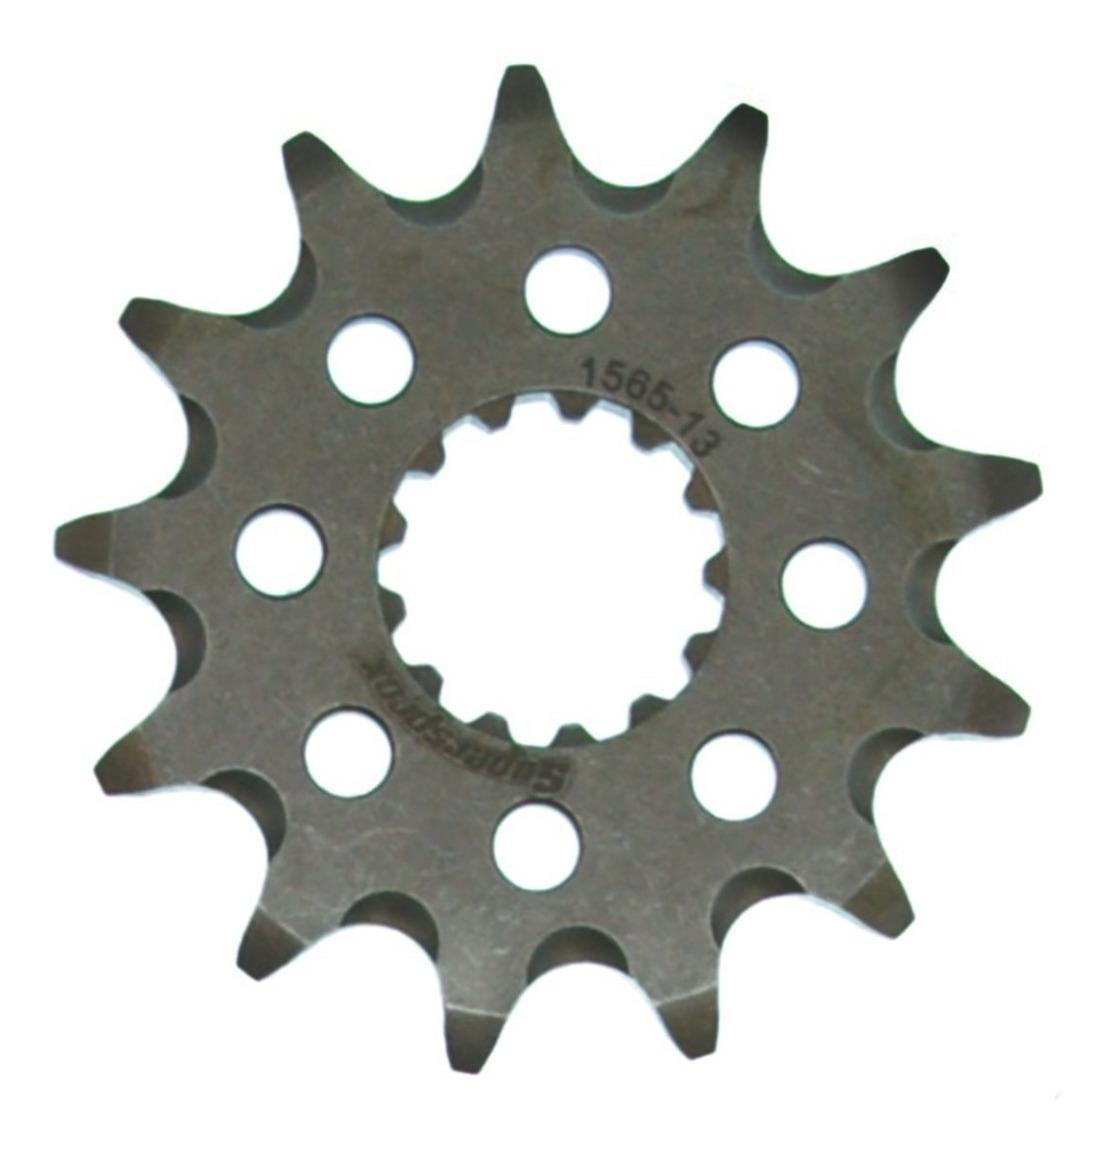 piñon acero superprox 1565 13T-520 KAWASAKI KX 450F